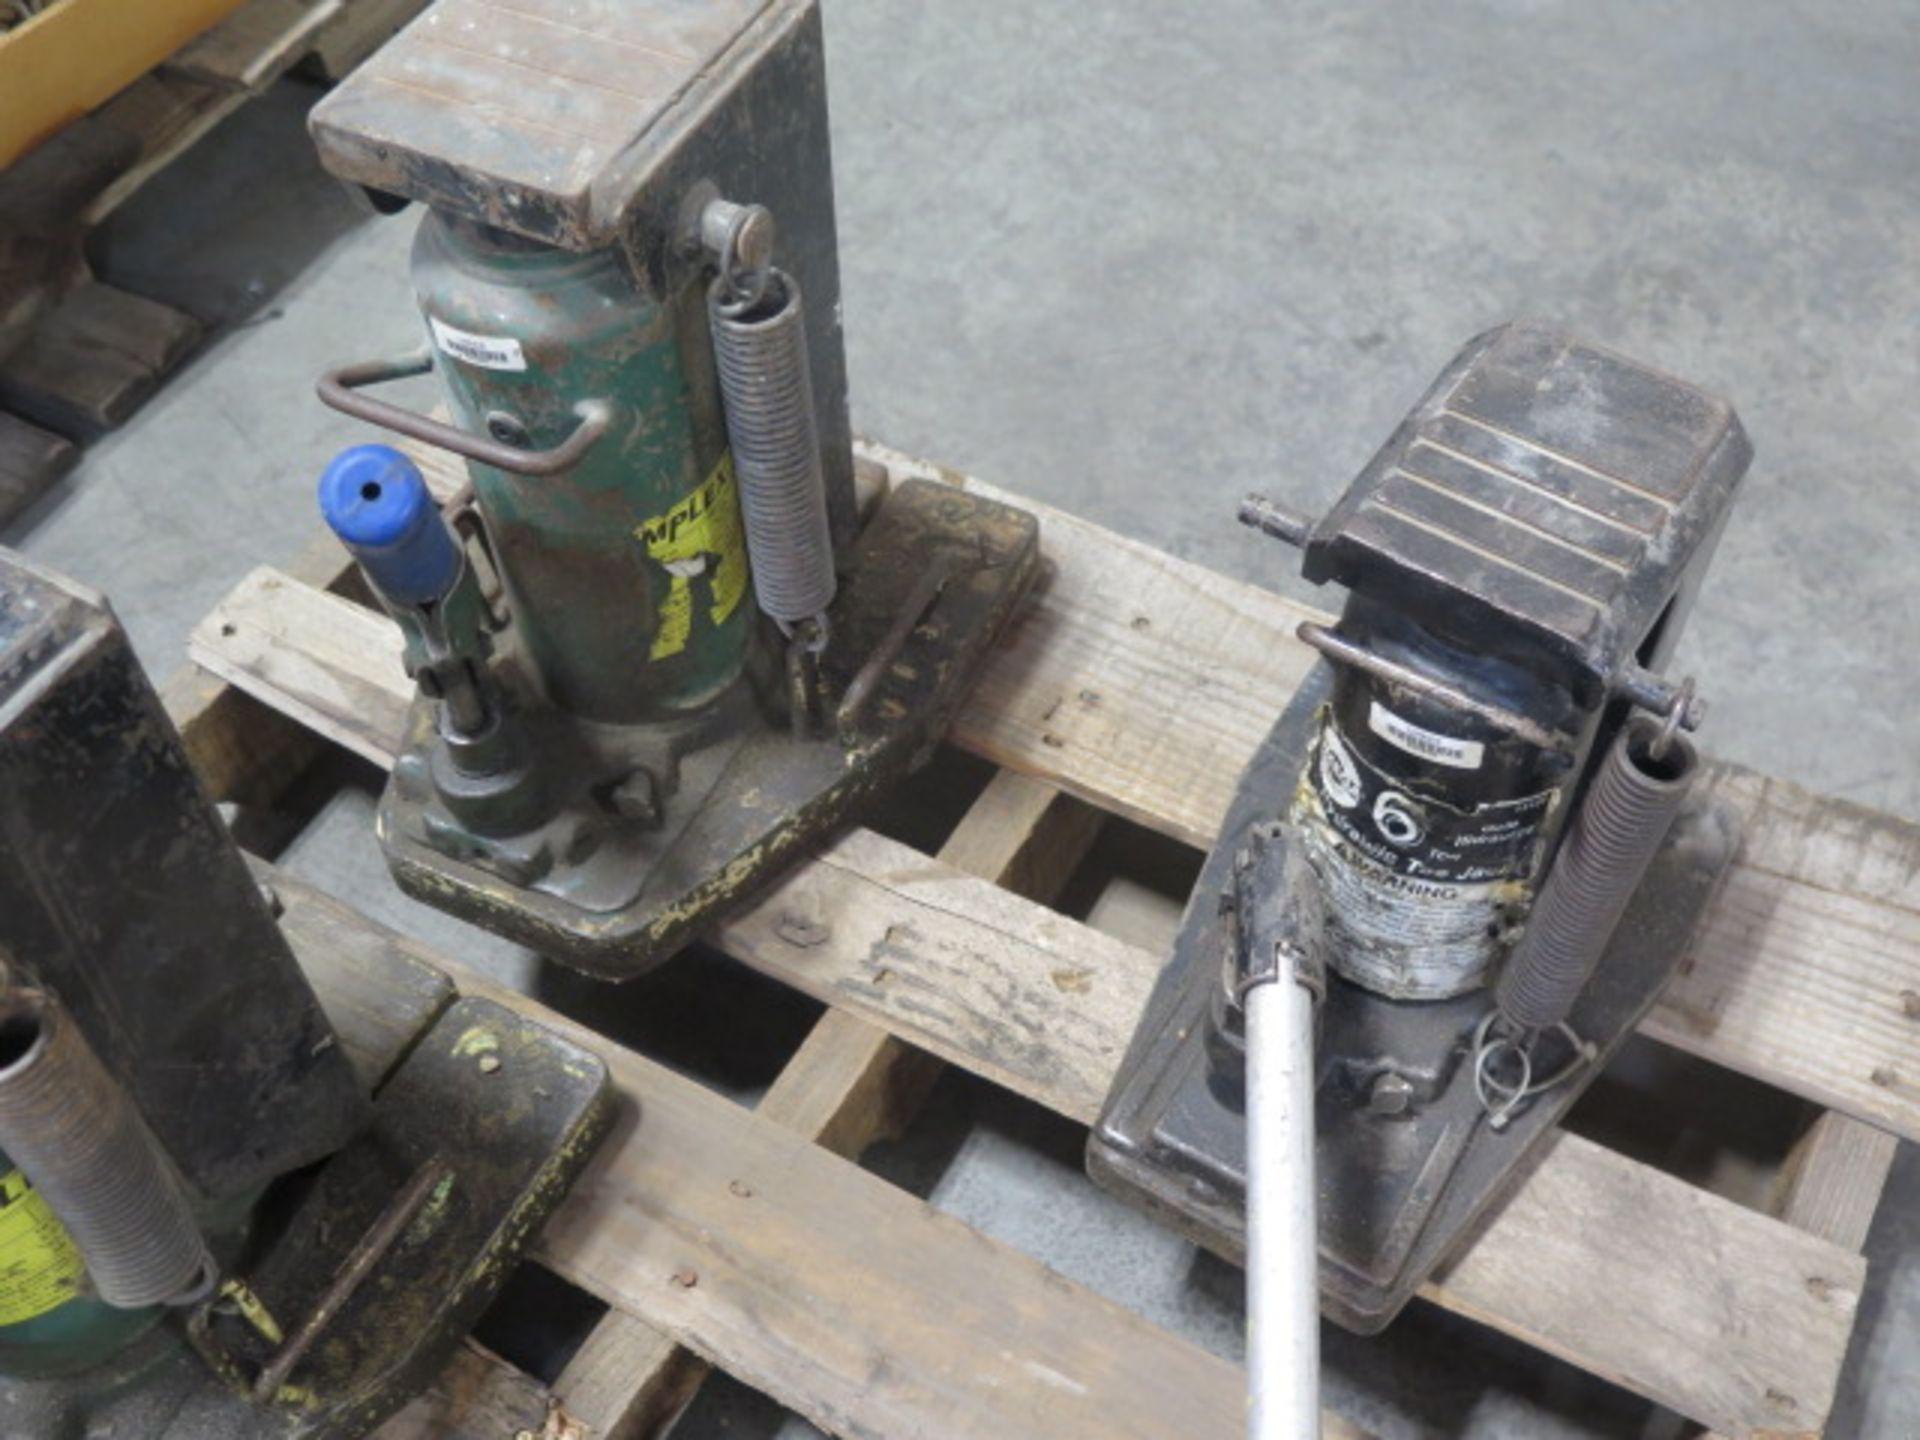 Simplex 10 Ton Hydrauic Machinery Jacks (2) and Omega 6 Ton Hydraulic Machinery Jack (SOLD AS-IS - - Image 6 of 7